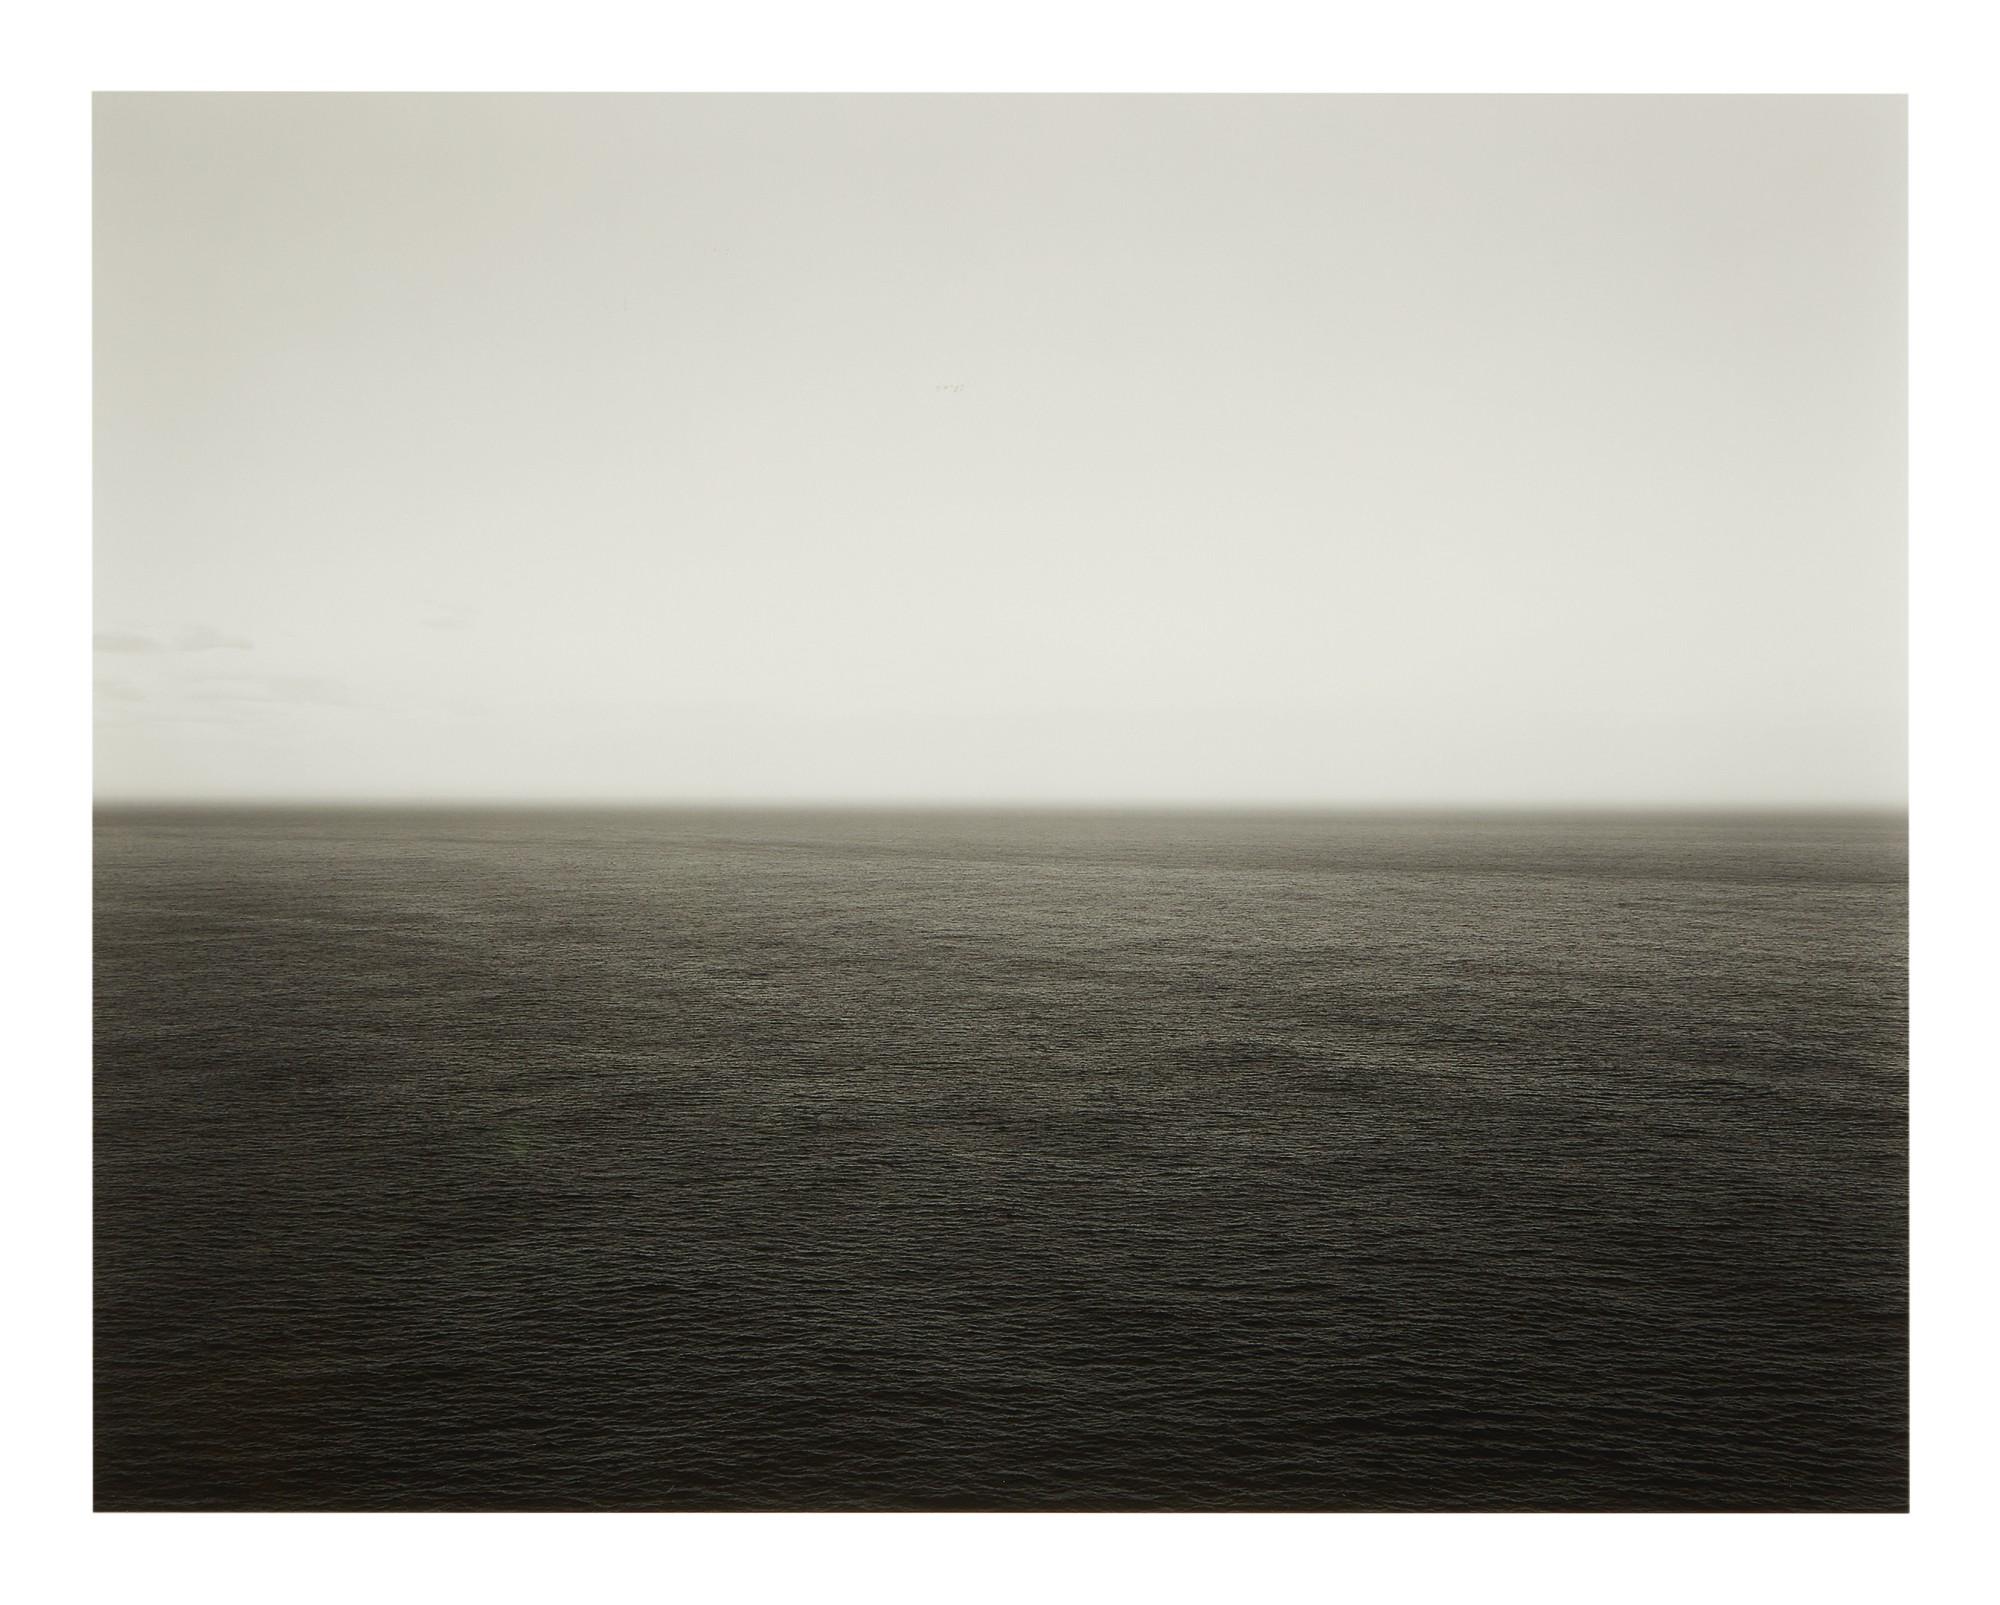 HIROSHI SUGIMOTO   SEA OF OKHOTSK, HOKKAIDO